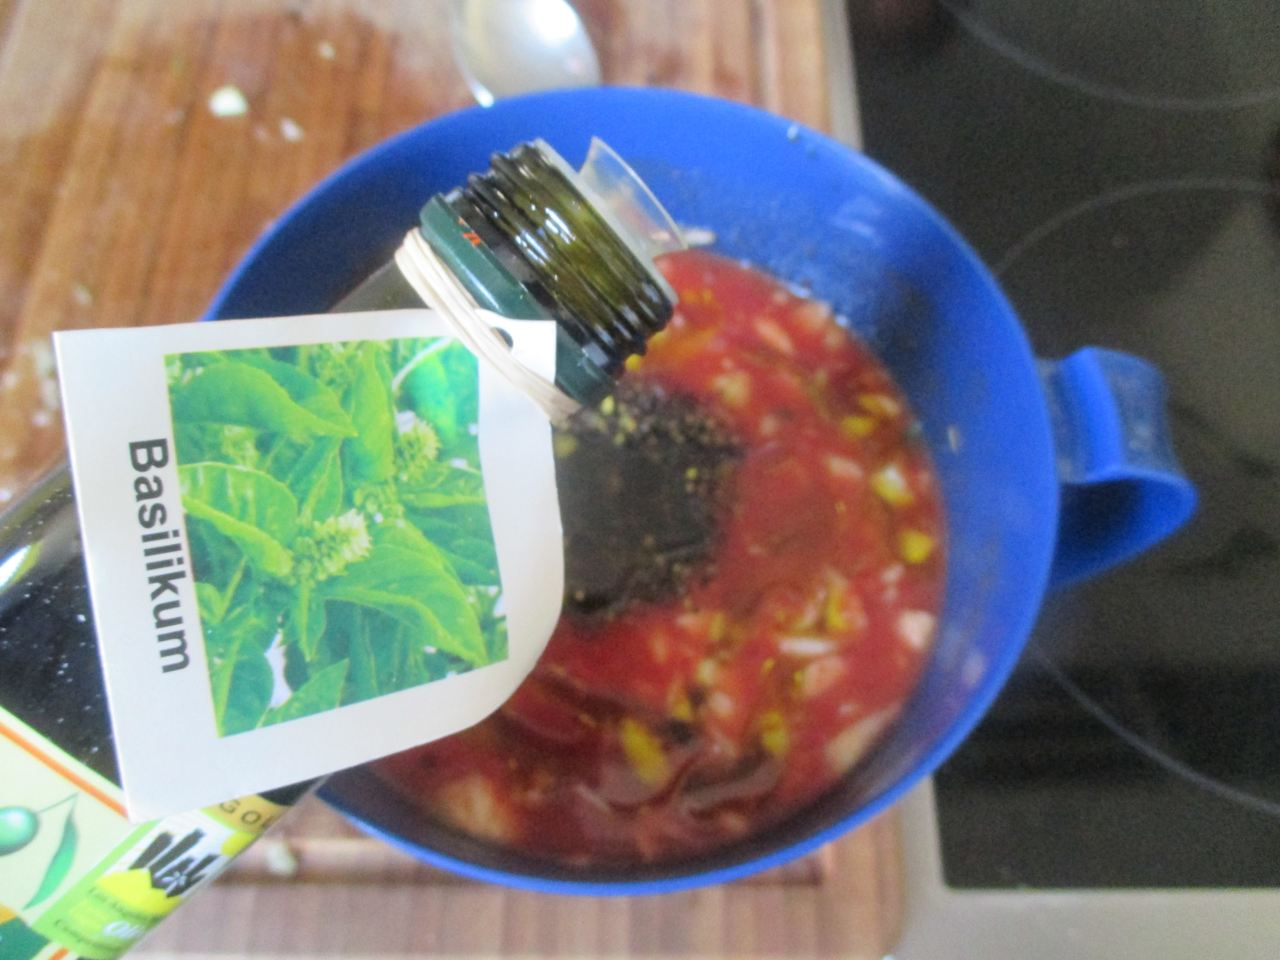 Mit Basilikum-Olivenöl  die Zucchini-Tomatensauce pikant  würzen